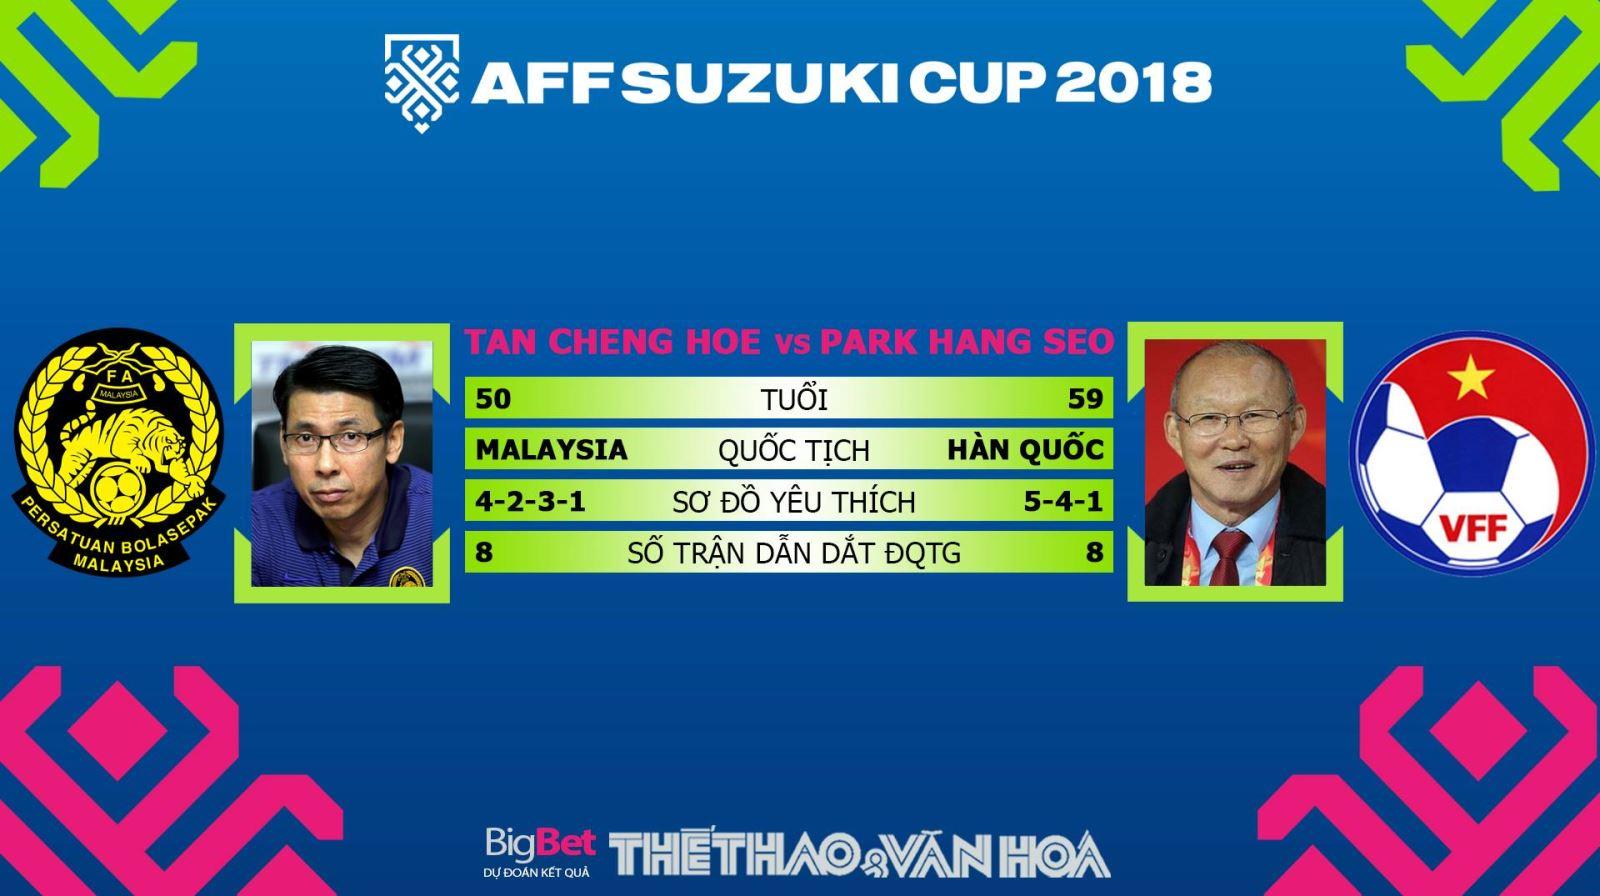 Vtv6, vtv6 trực tiếp bóng đá, trực tiếp bóng đá vtv6, truc tiep bong da vtv6, xem vtv6, vtv5, vtc3, truc tiep bong da vtvc3, truc tiep bong da vtv5, vtv6 truc tiep Malaysia vs Việt Nam.